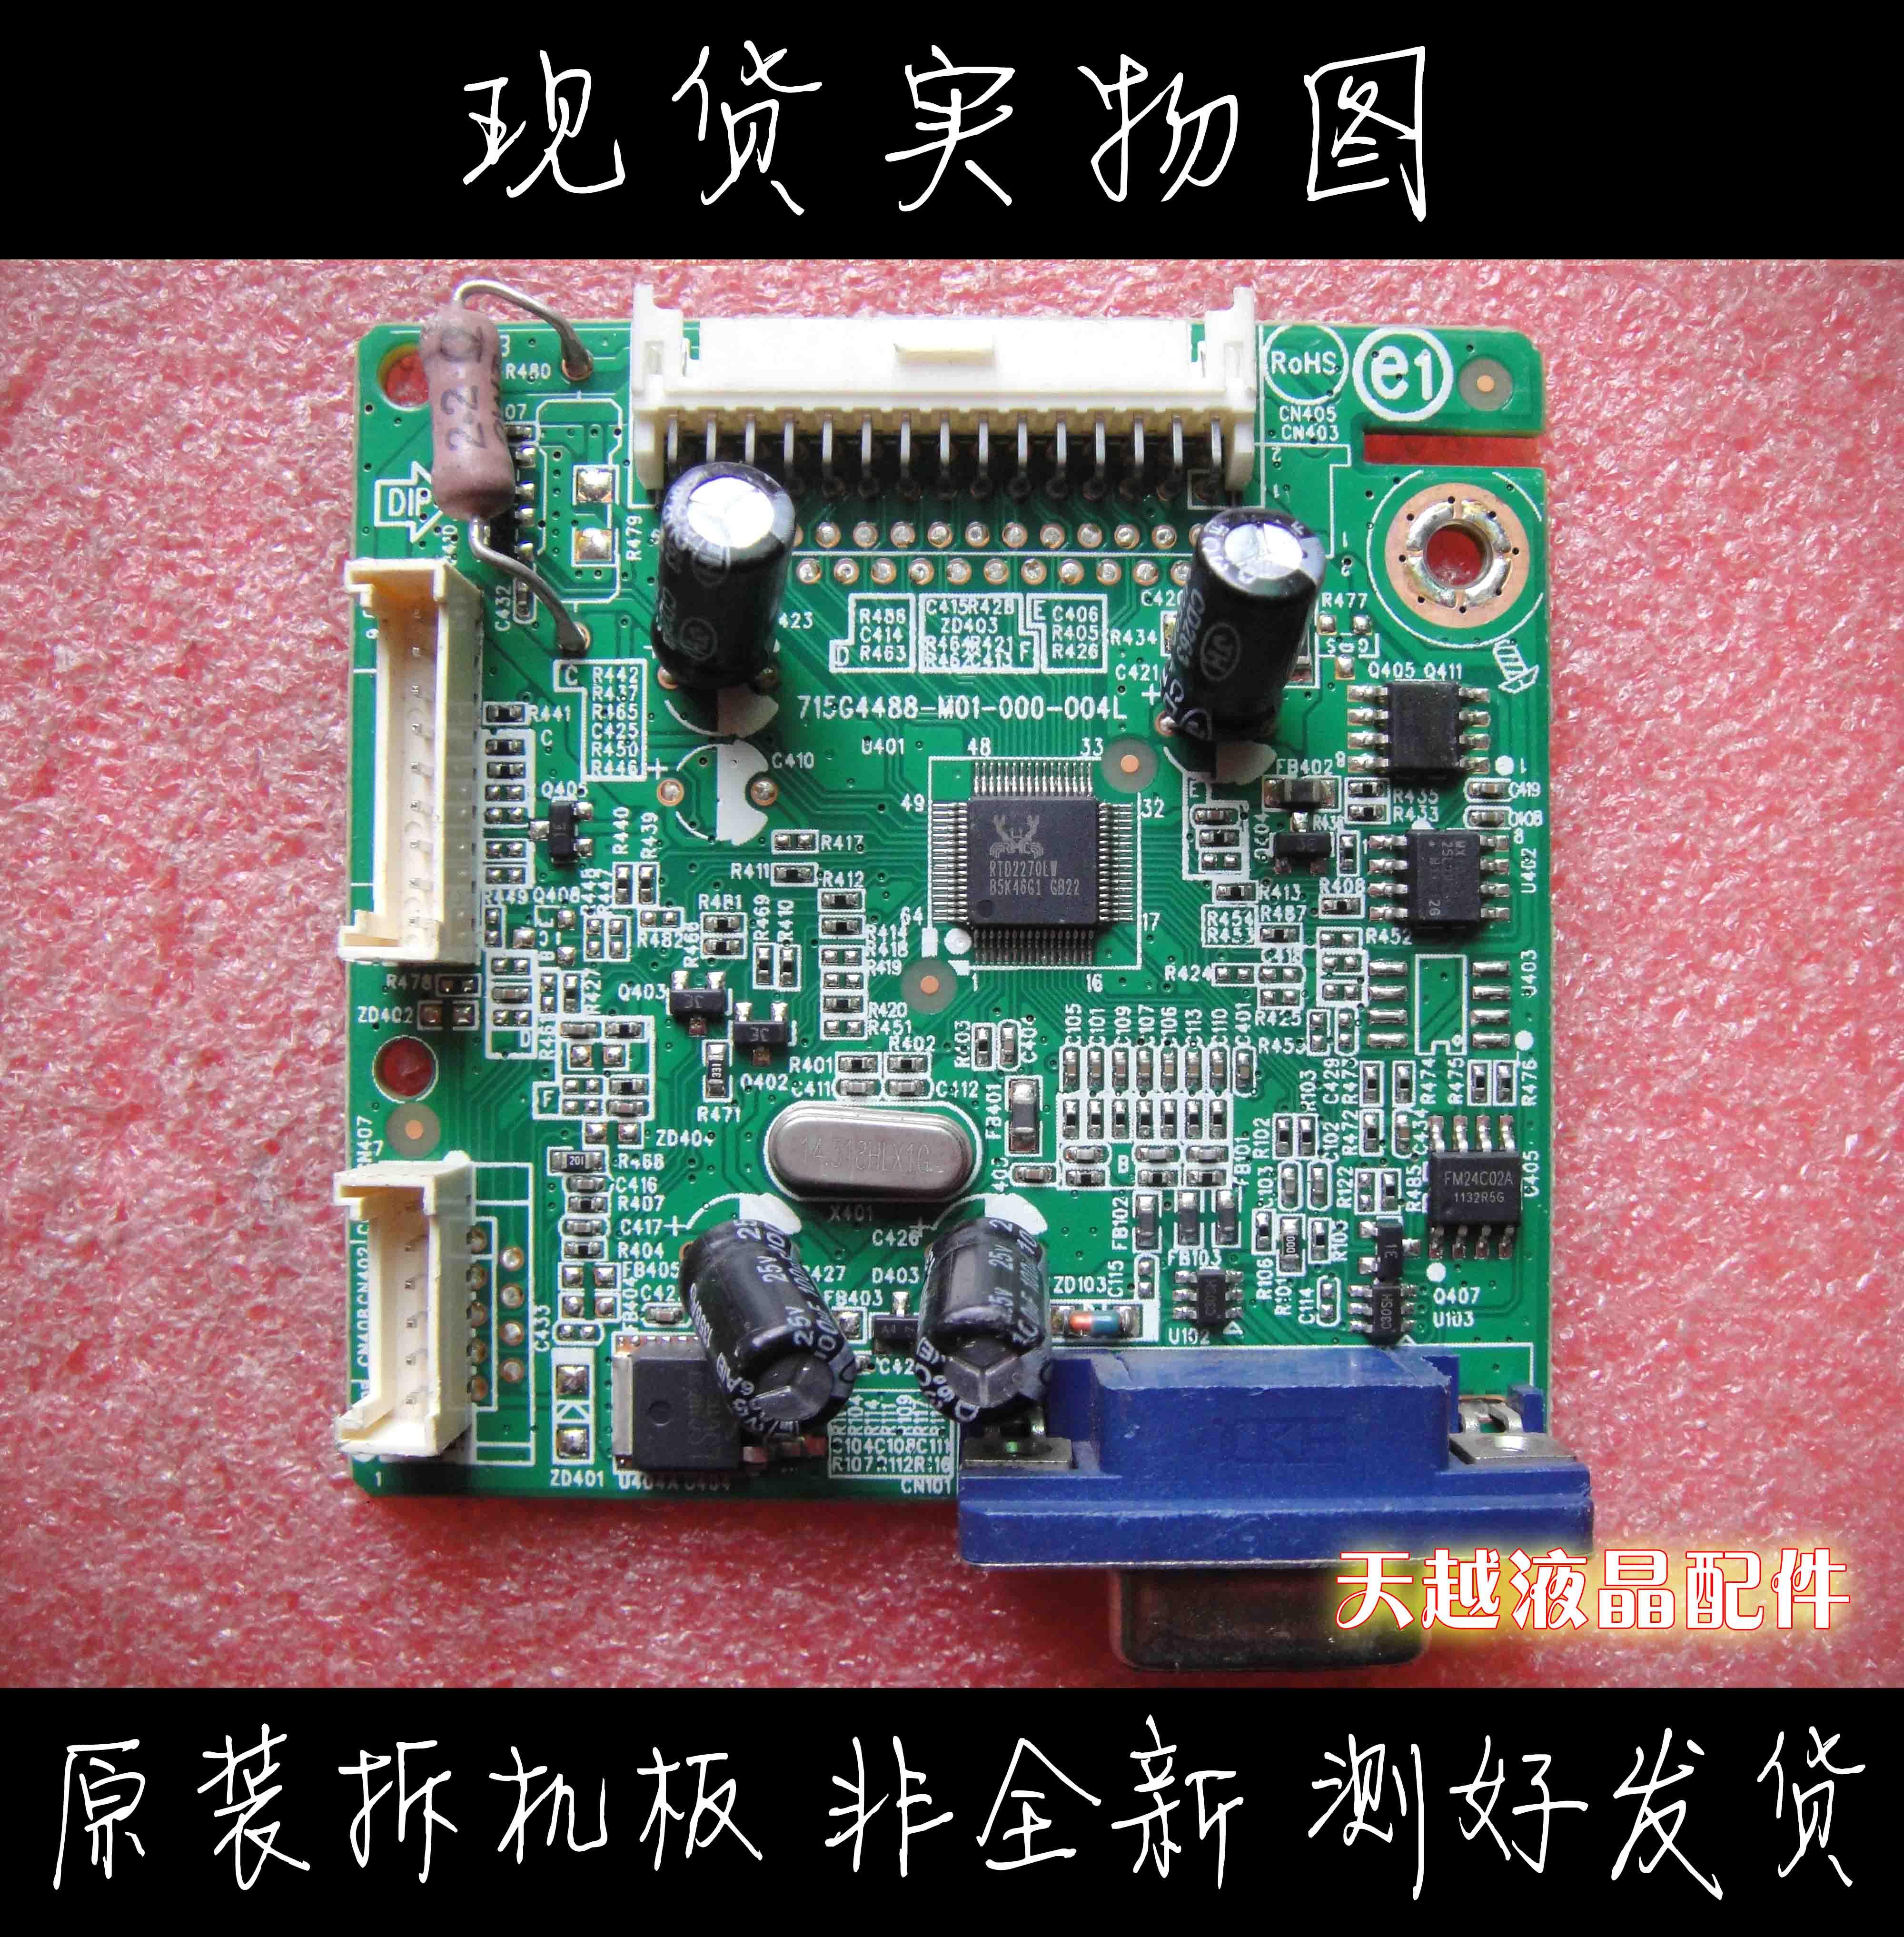 Placa base Original Envision H919wn + placa base T915s 715g4488-m01-000-004l